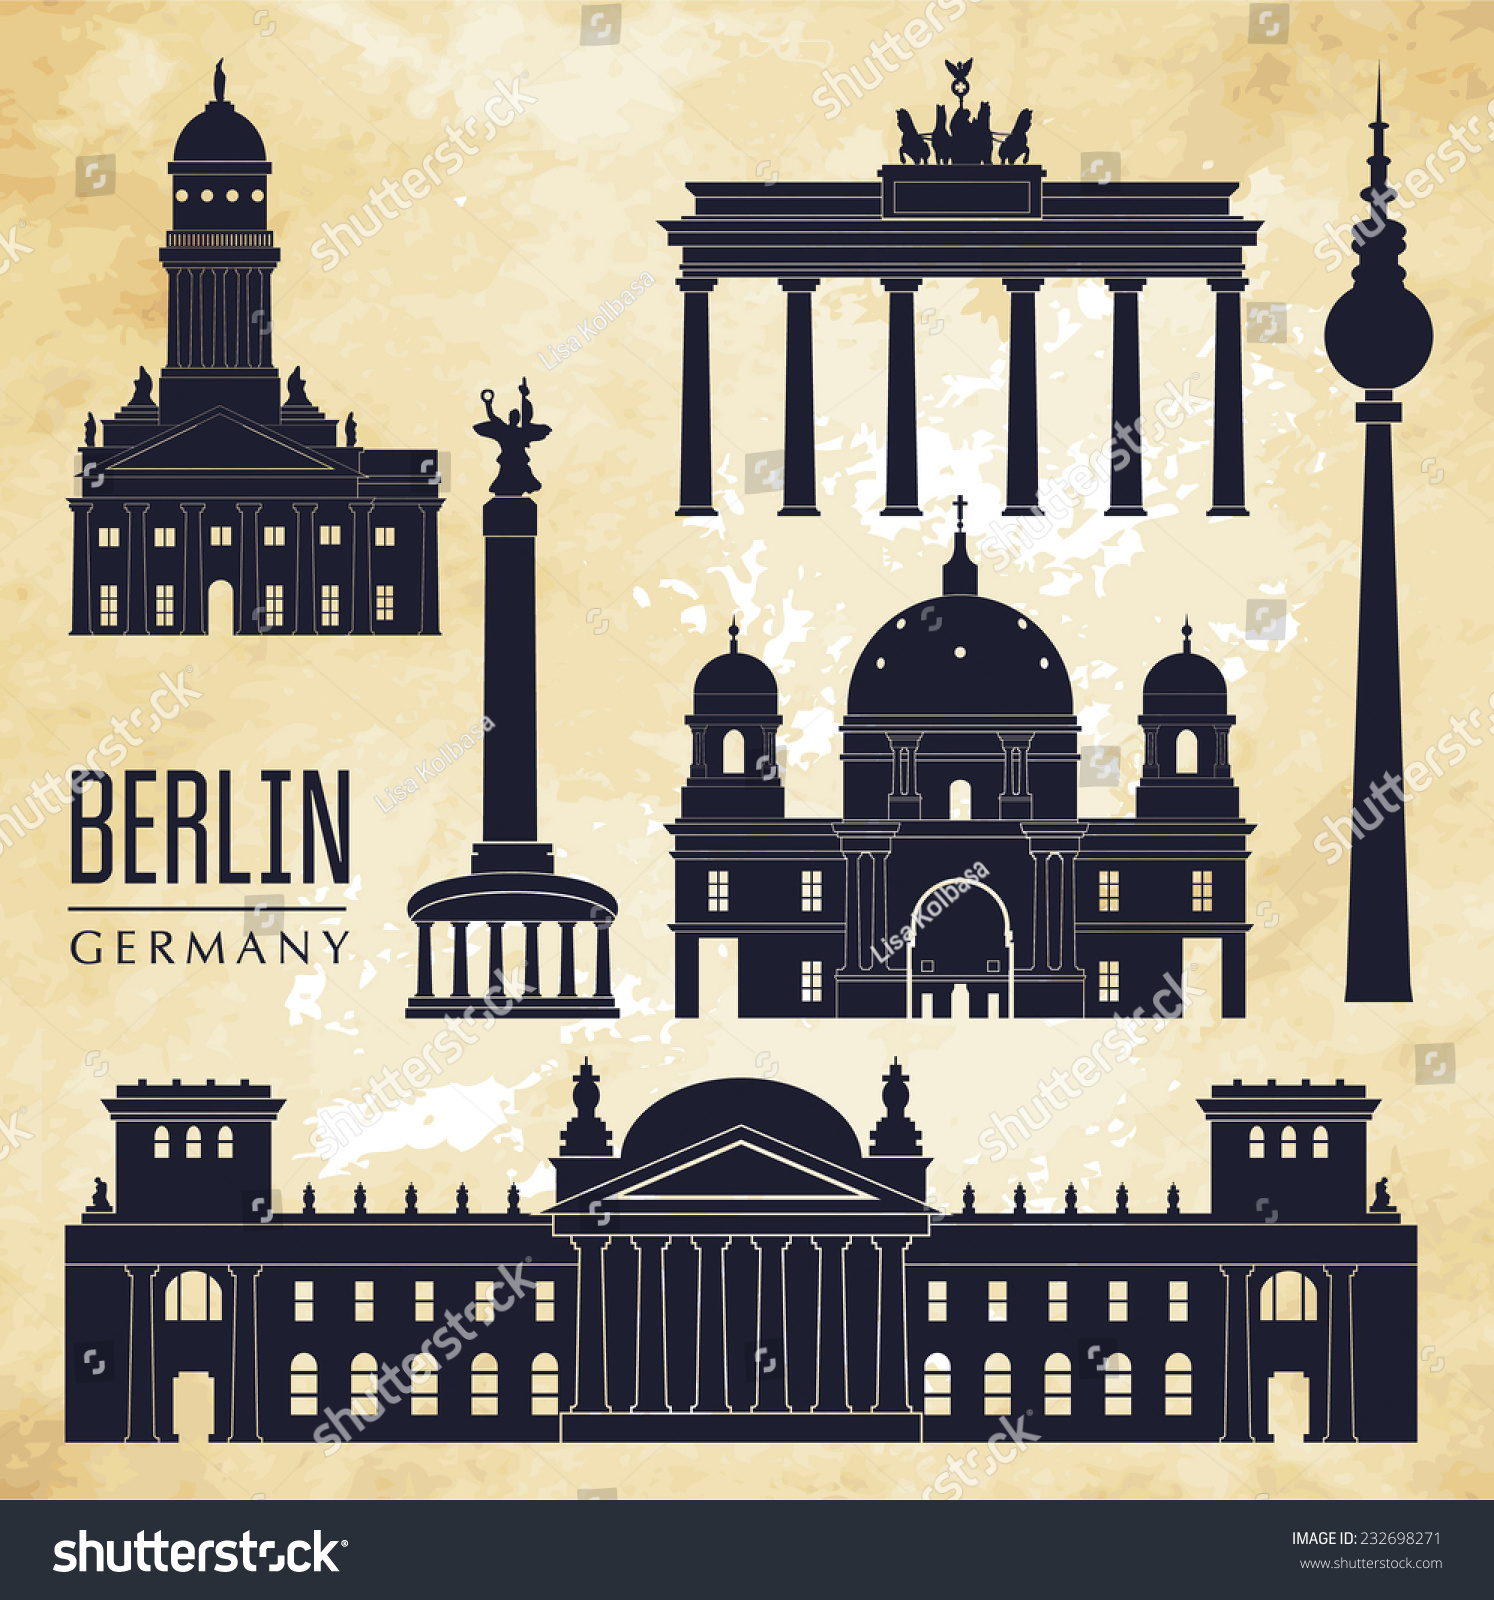 berlin vector illustration 232698271 shutterstock. Black Bedroom Furniture Sets. Home Design Ideas